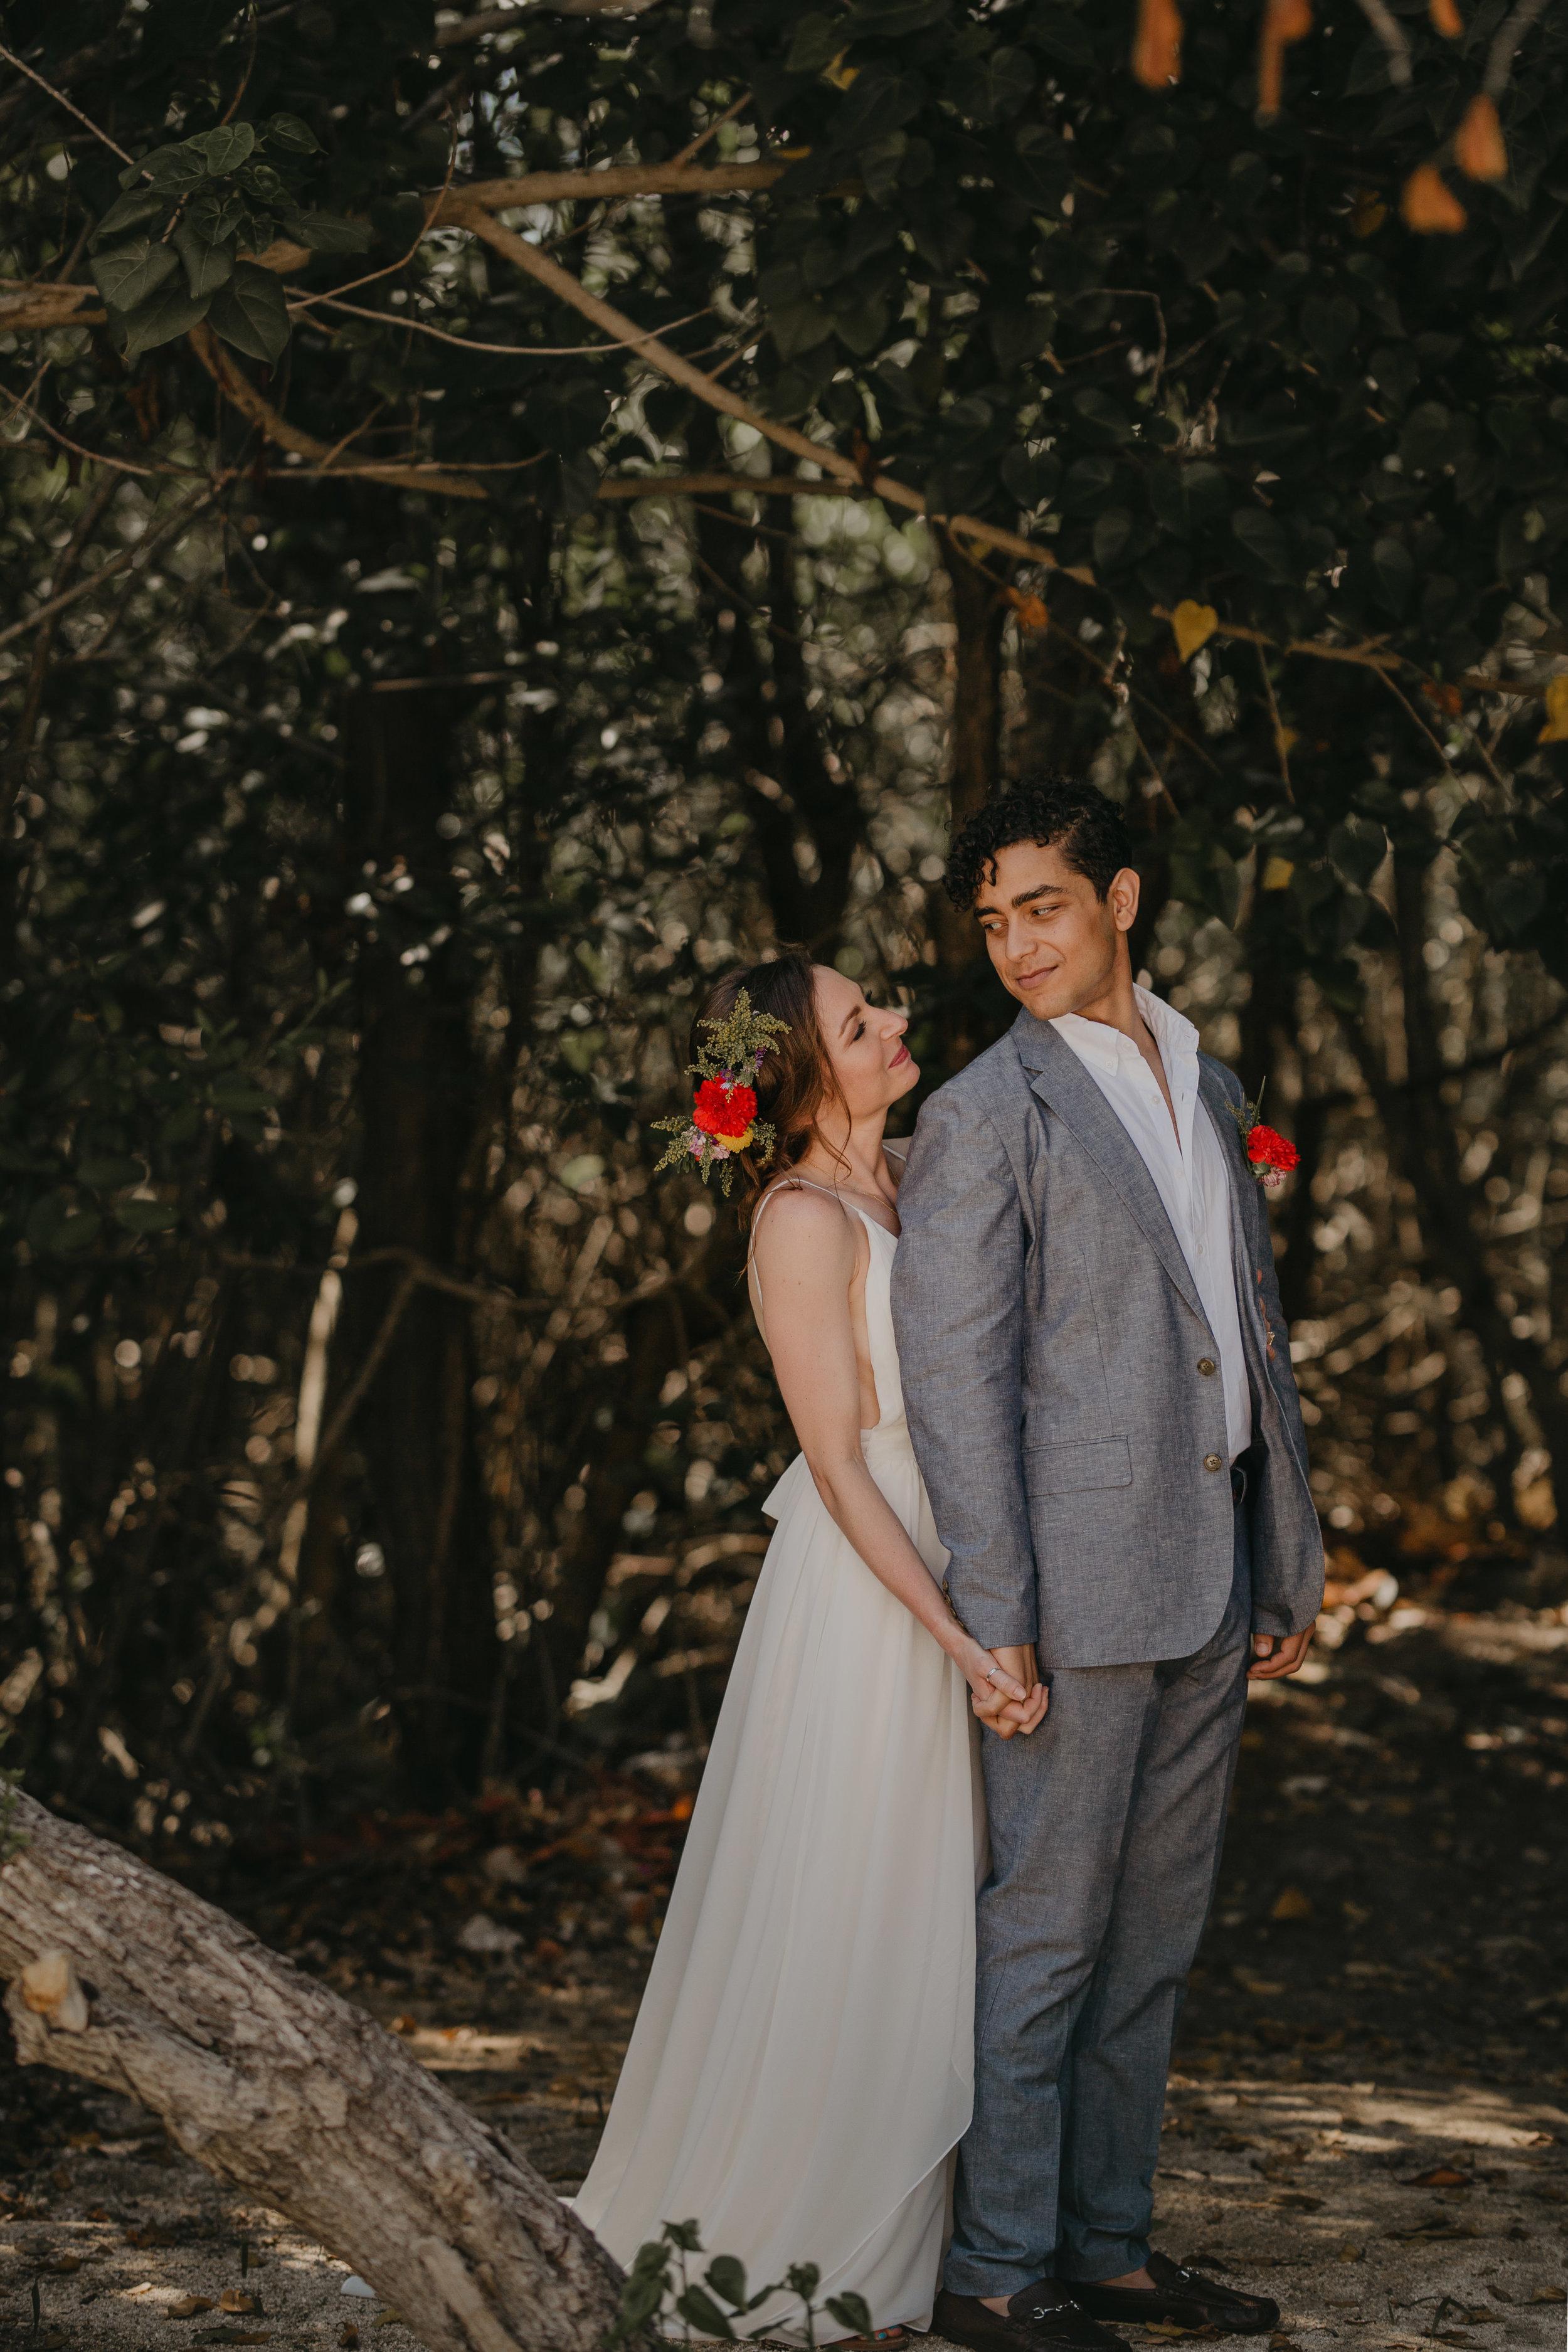 Nicole-Daacke-Photography-beachfront-akumal-destionation-wedding-tulum-mexico-elopement-photographer-destination-wedding-inspiration-sunset-champagne-pop-boho-bride-ocean-tropical-bohemian-tulum-wedding-photos-123.jpg